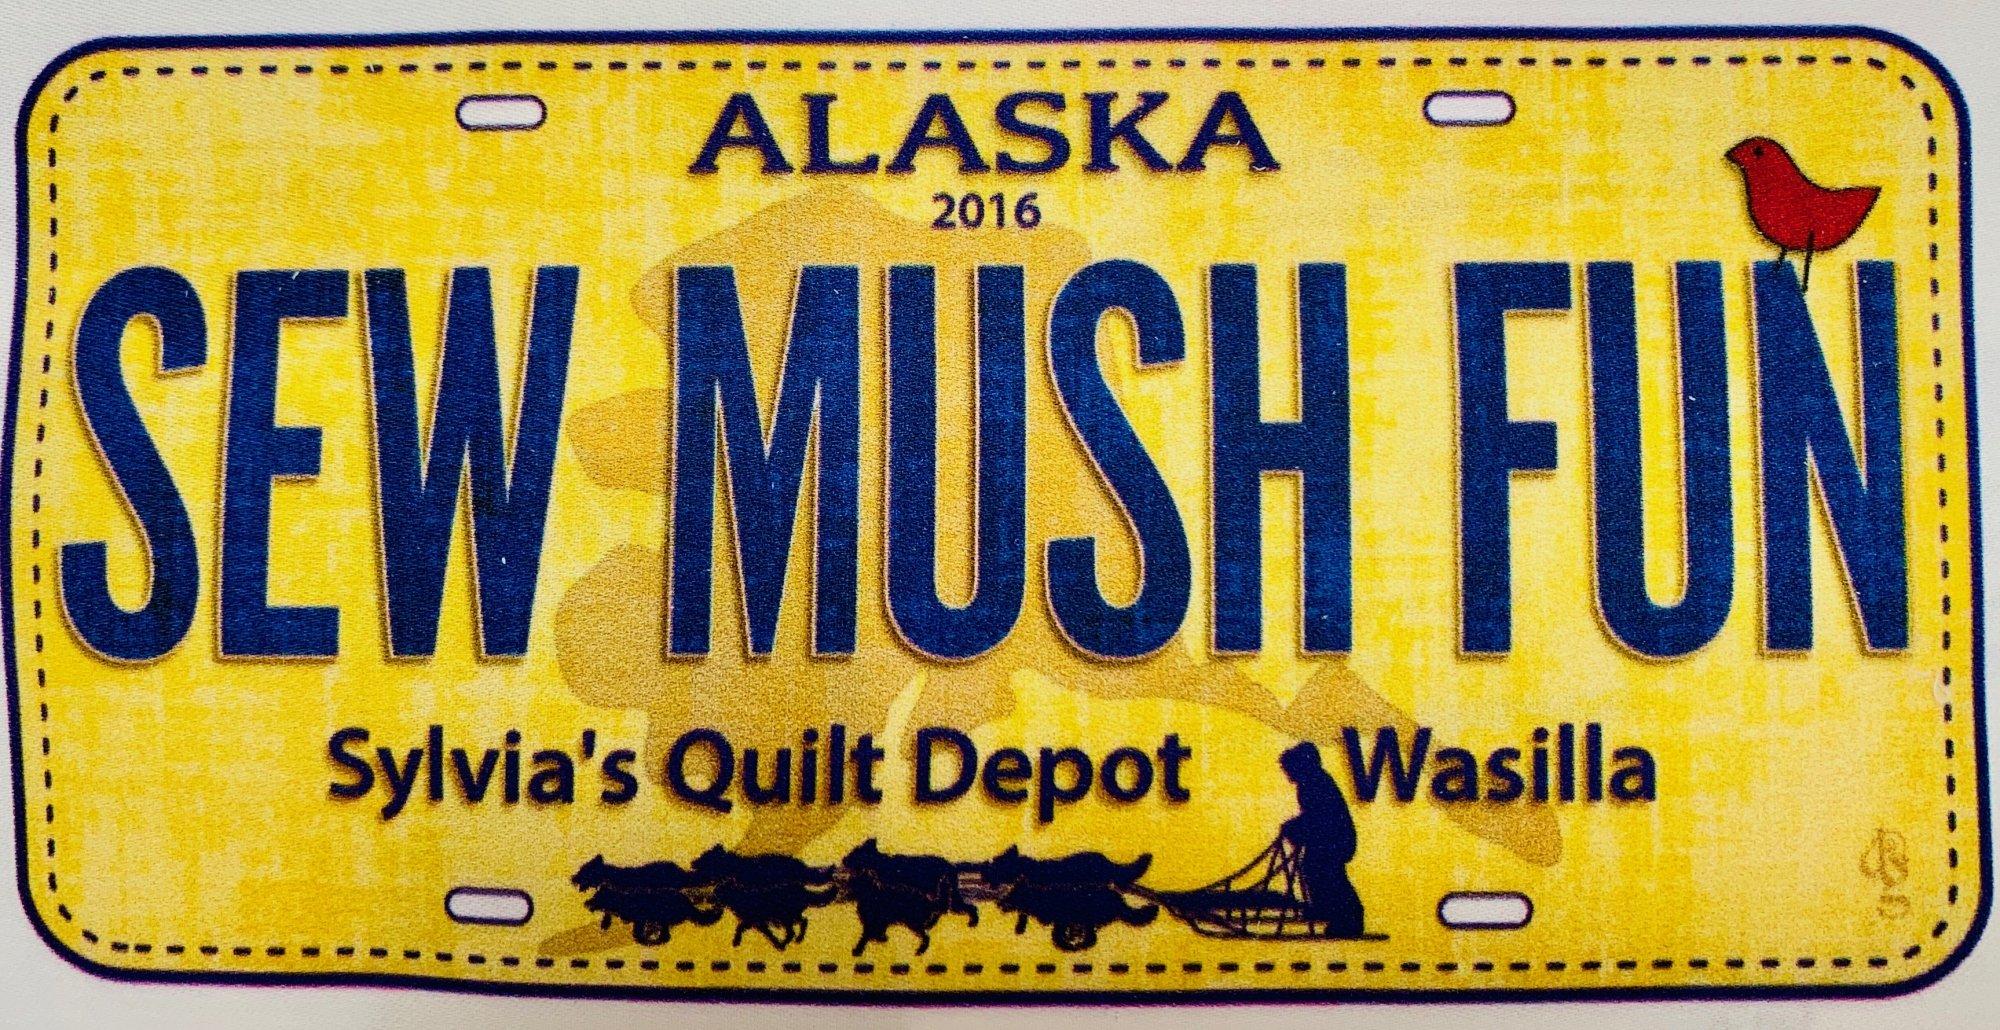 2016 License Plate-Sew Mush Fun